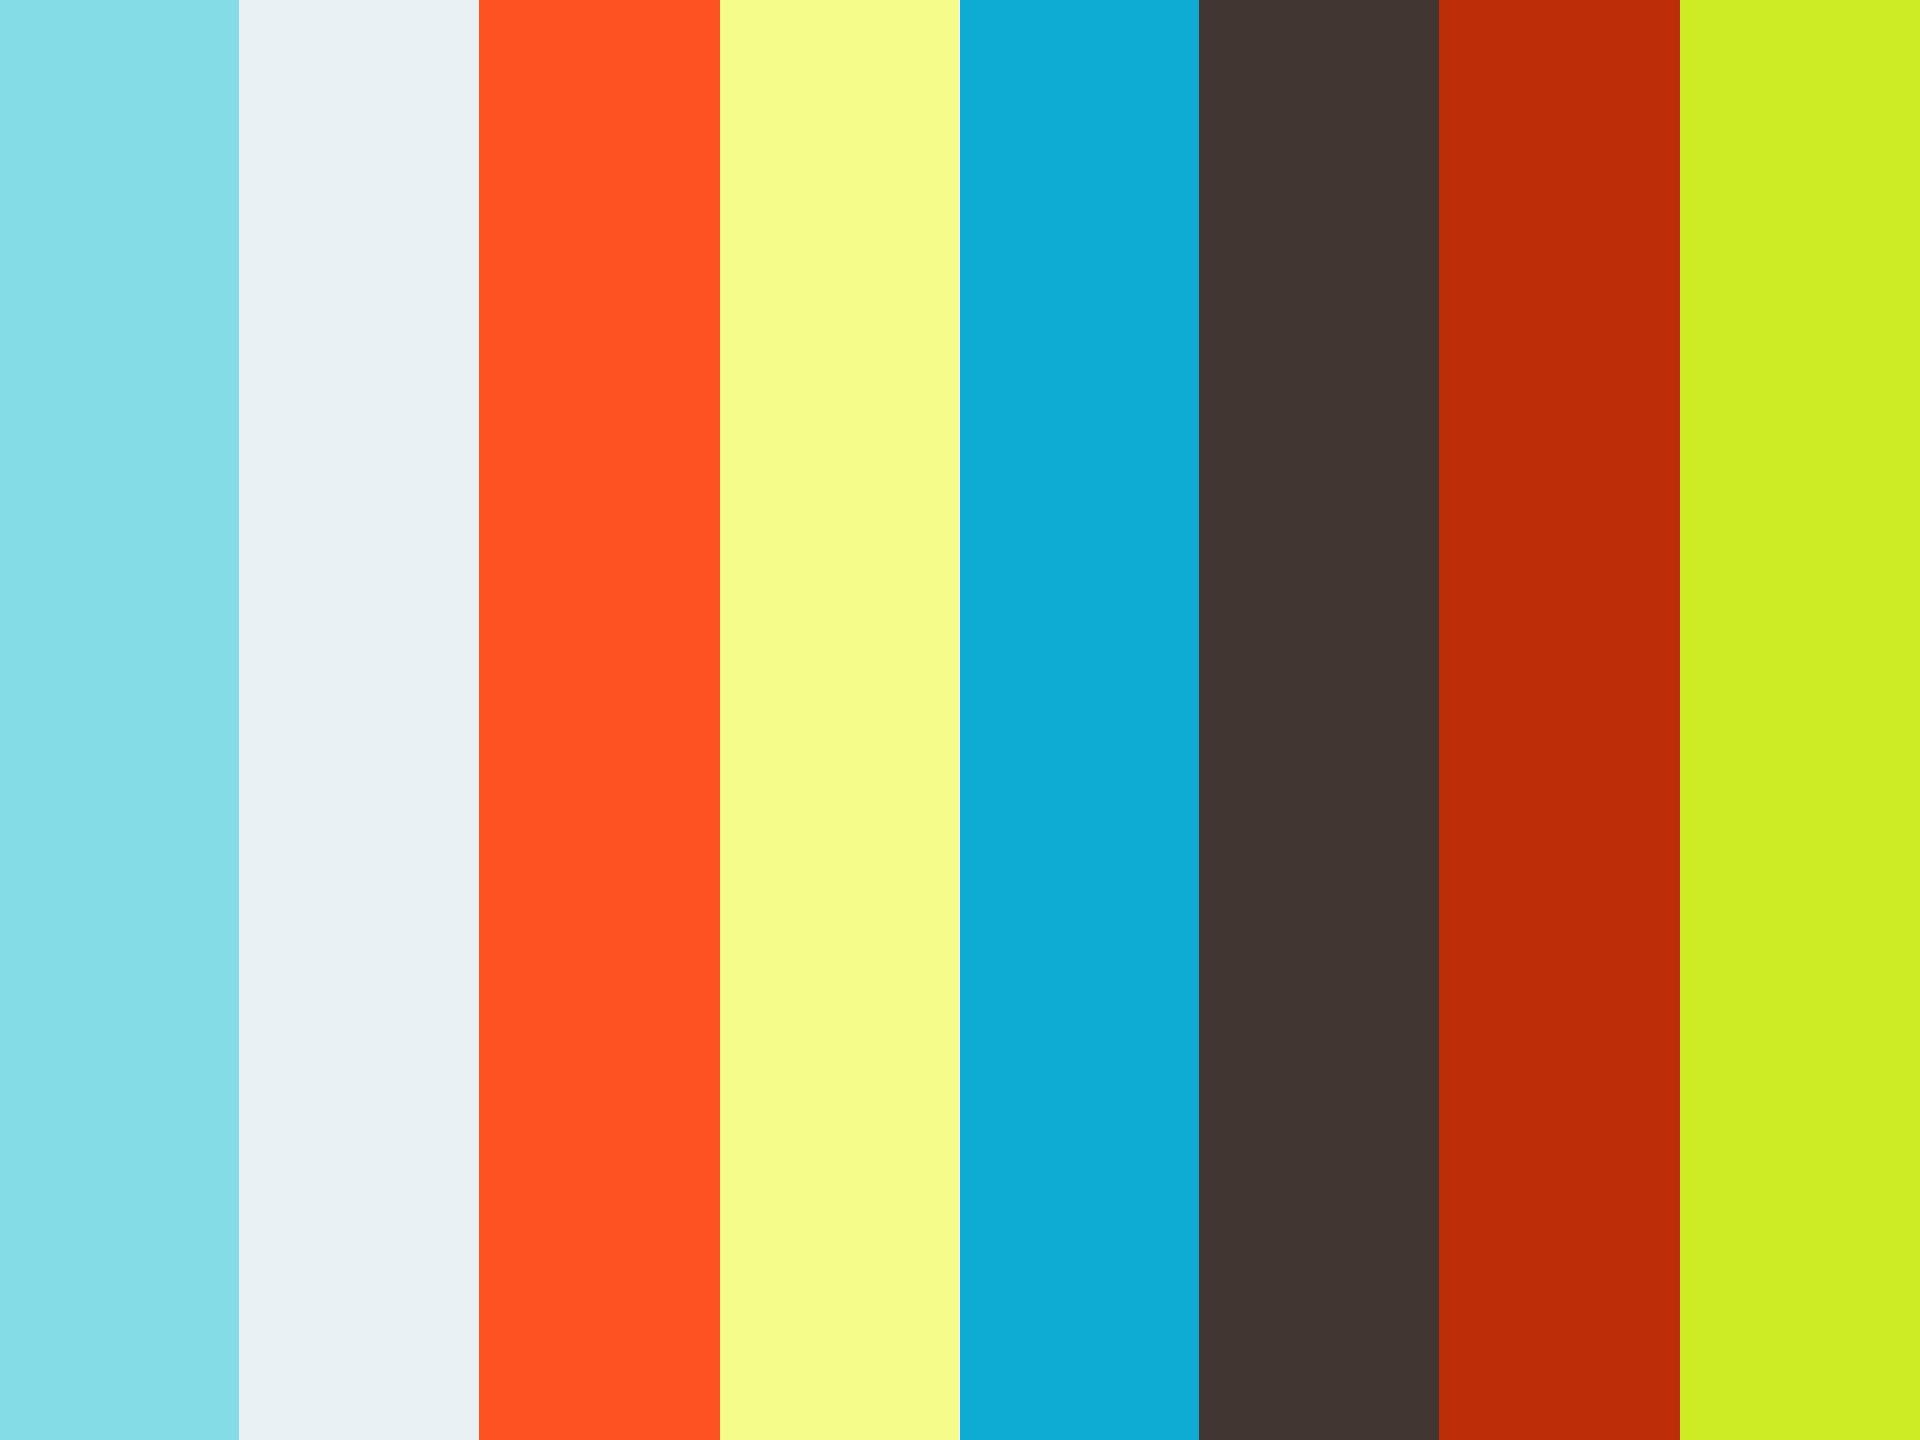 Peter Wyngarde (1927-2018 (born in Marseille, France) Hot tube Sorel Carradine,Leslie Bibb